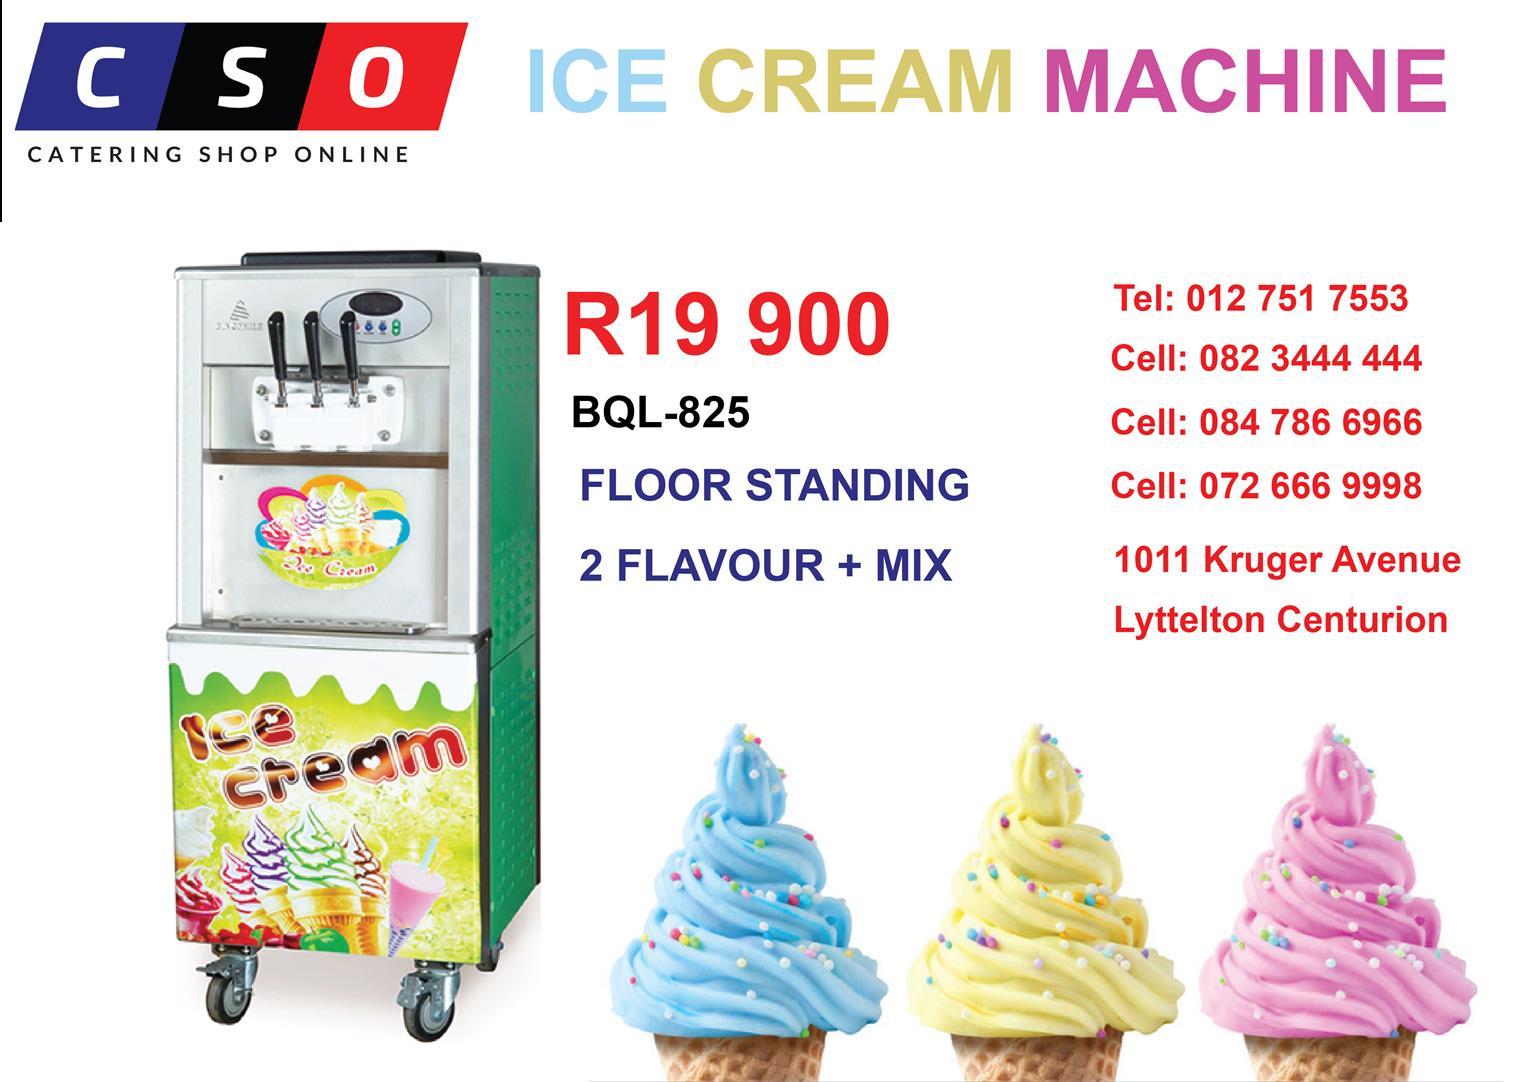 Ice Cream Machine 2 Flavour + Mix Floor Standing